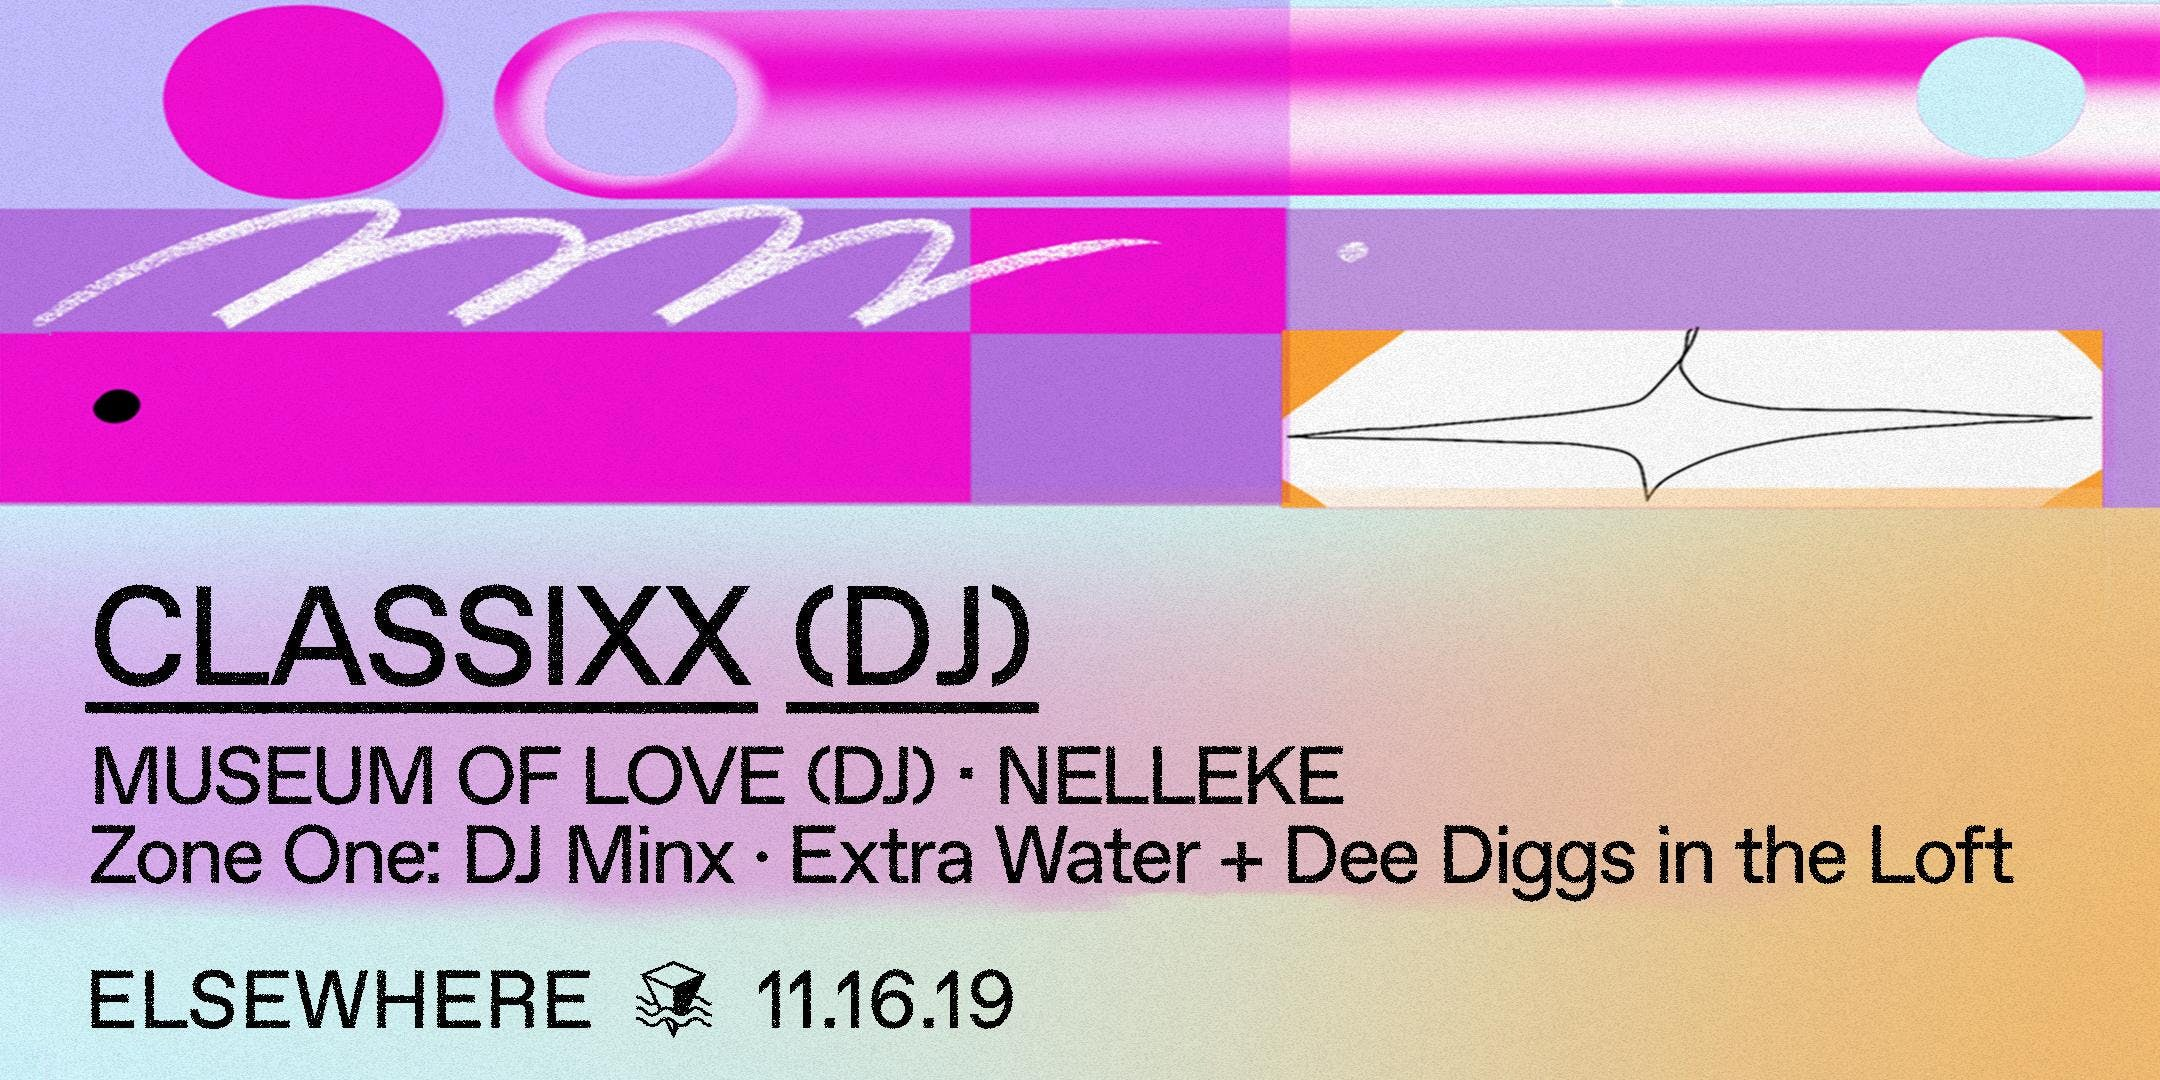 Classixx (DJ Set), Museum of Love (DJ Set), Nelleke, DJ Minx, Extra Water & Dee Diggs